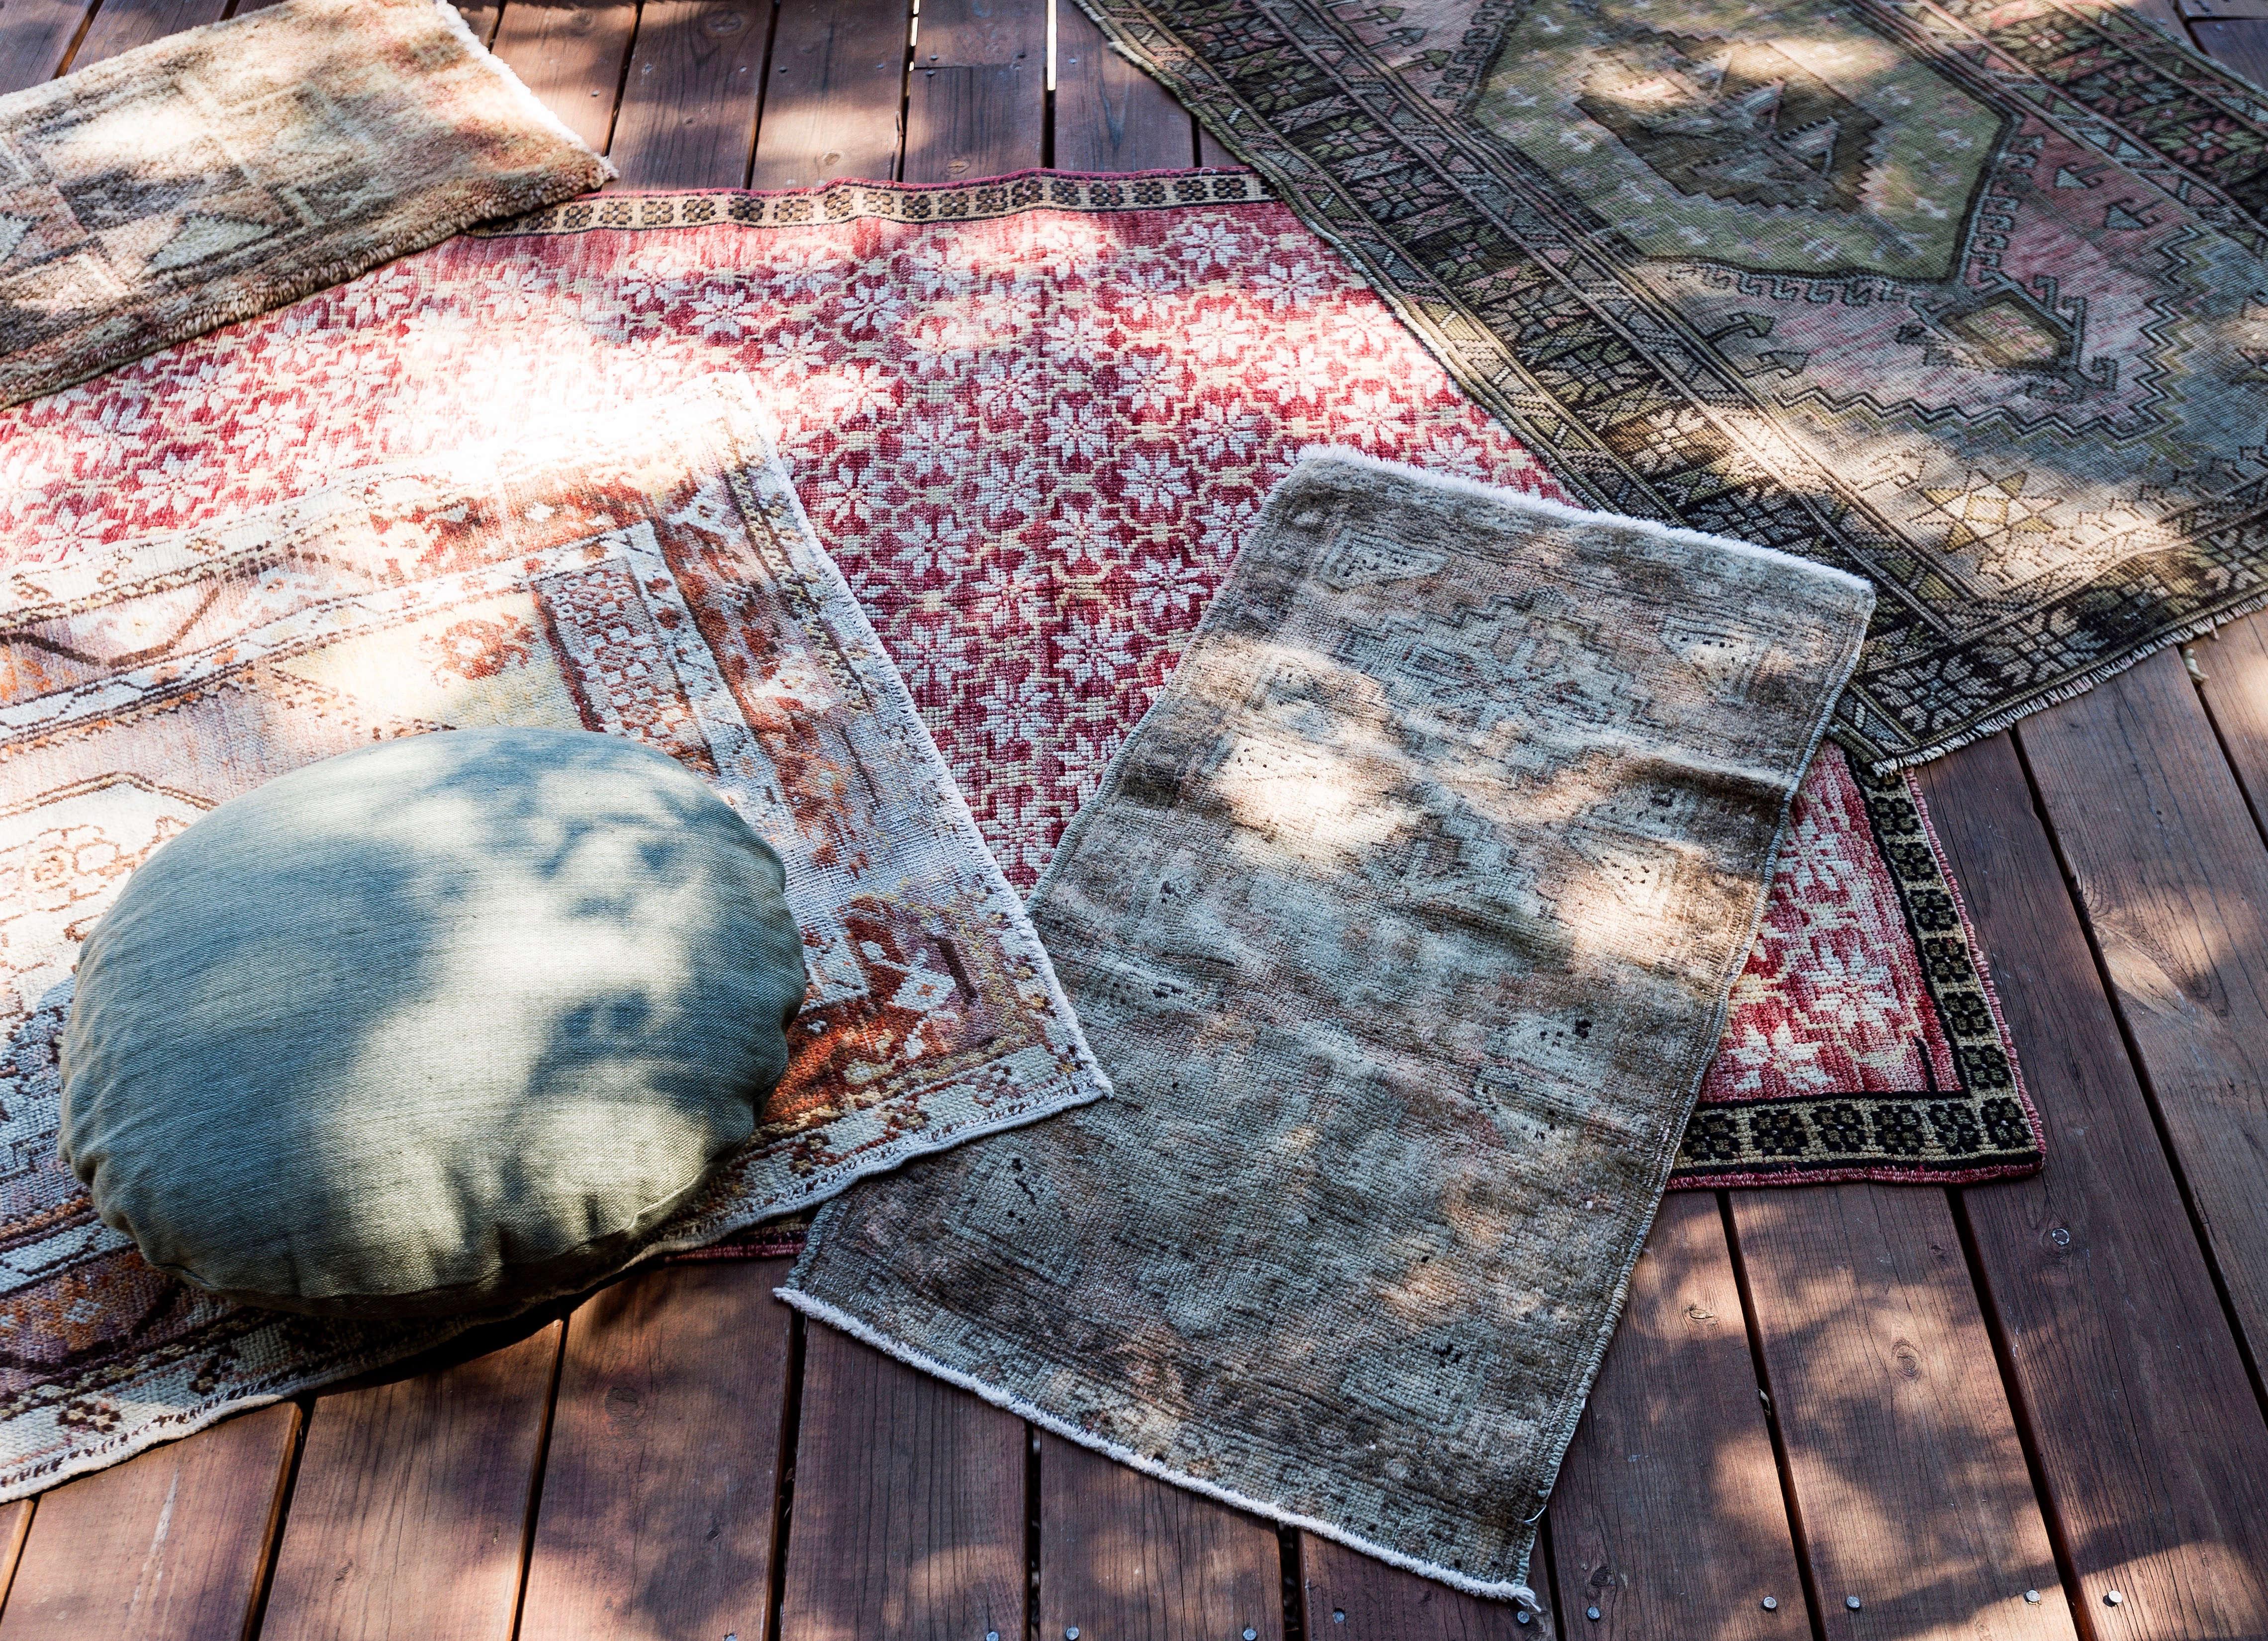 outdoor-rugs-kilim-napa-glamping-matthew-williams-dsc-1909